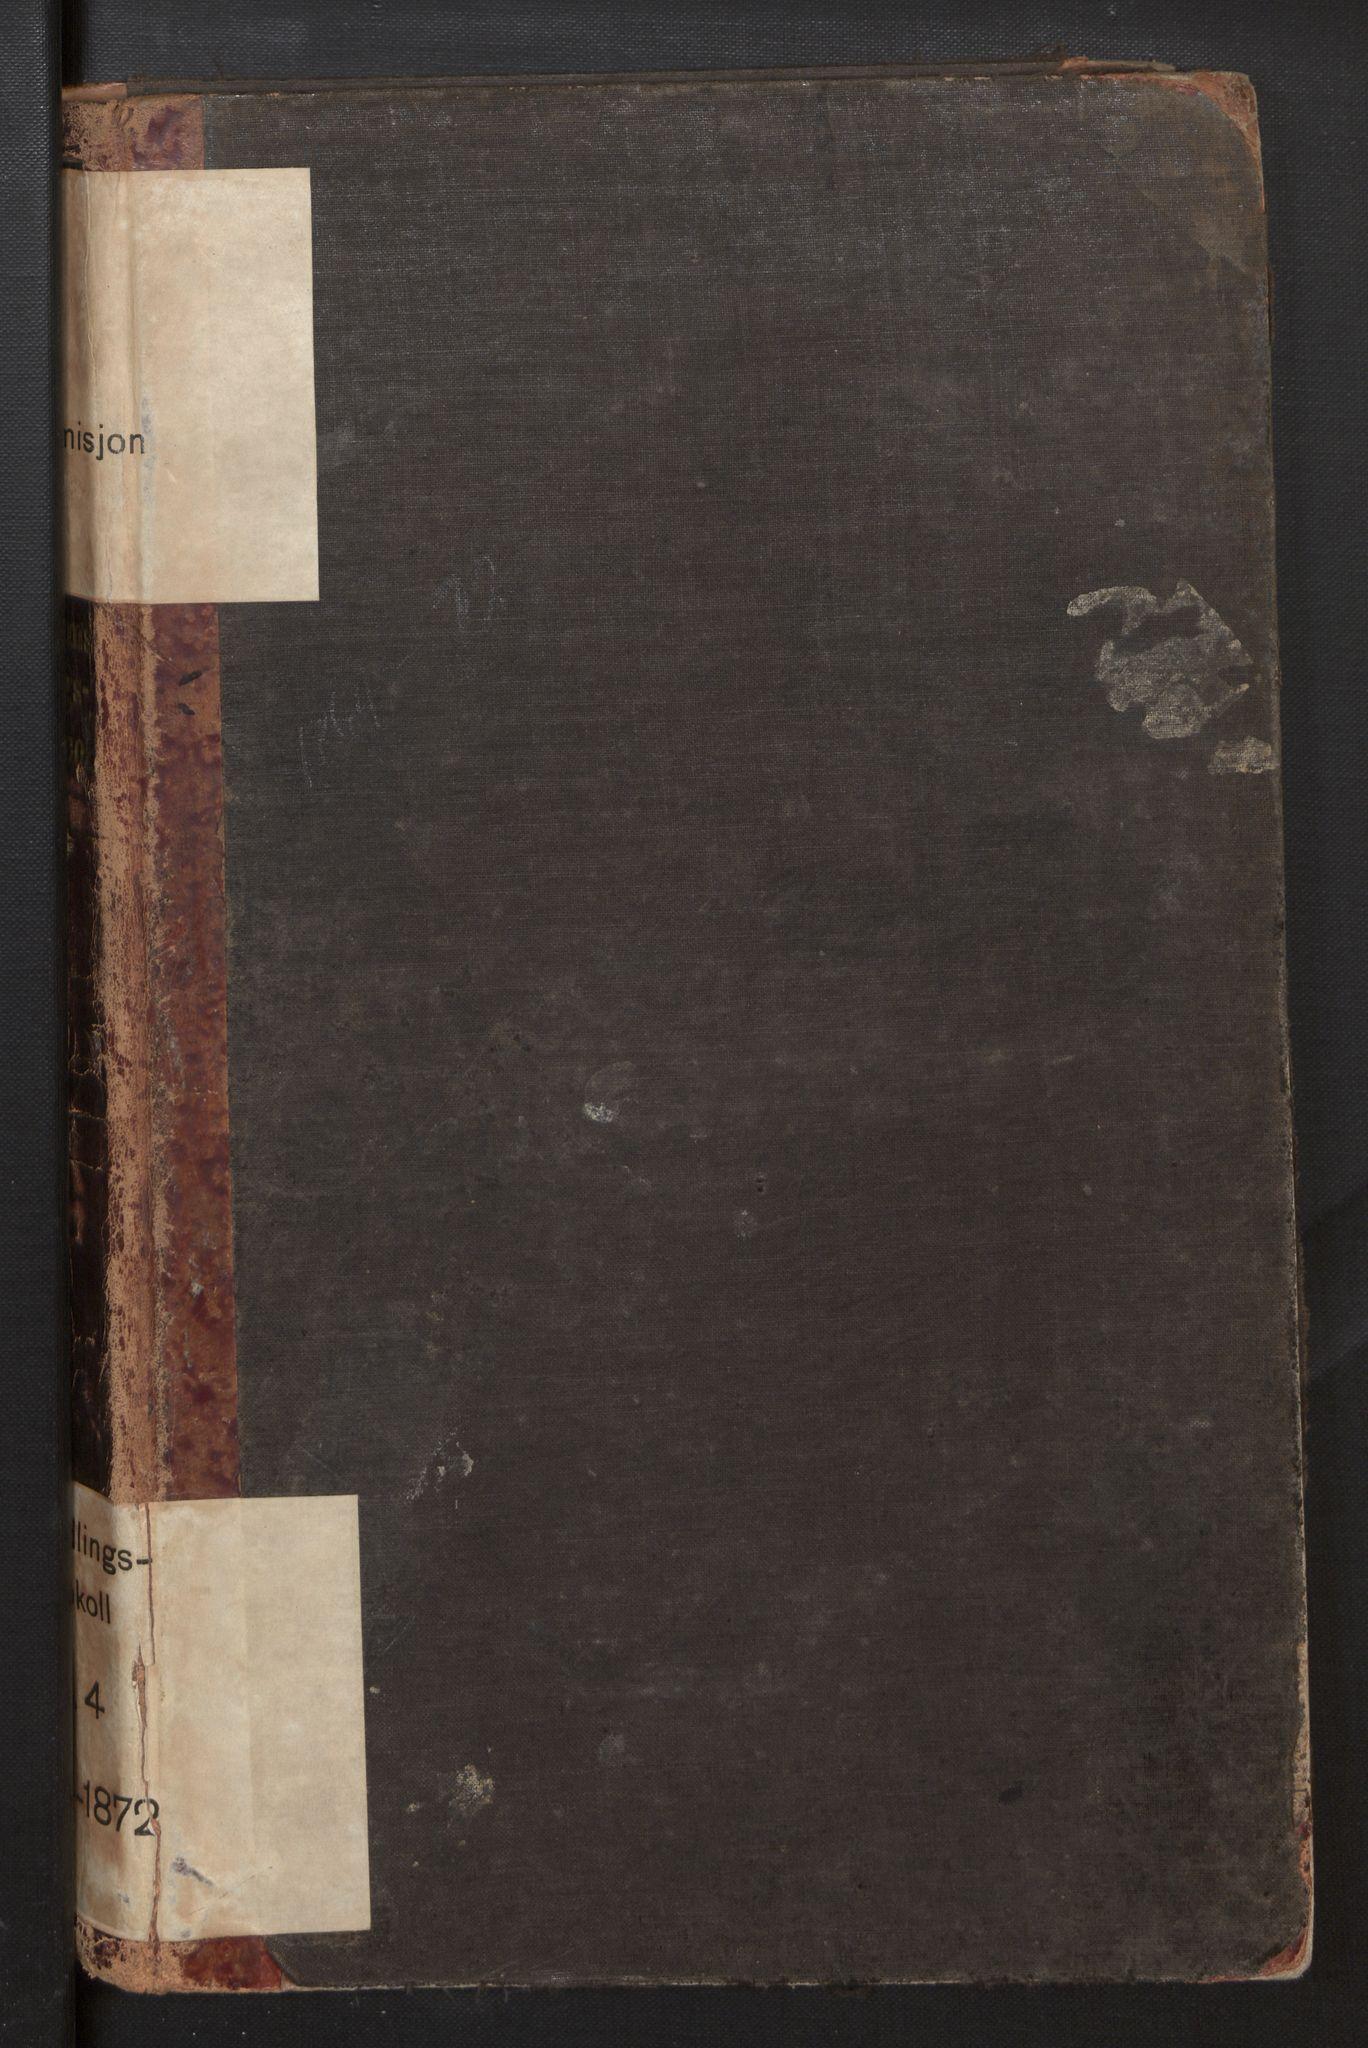 SAB, Eid (og Davik) forliksråd, A/L0004: Forhandlingsprotokoll, 1864-1872